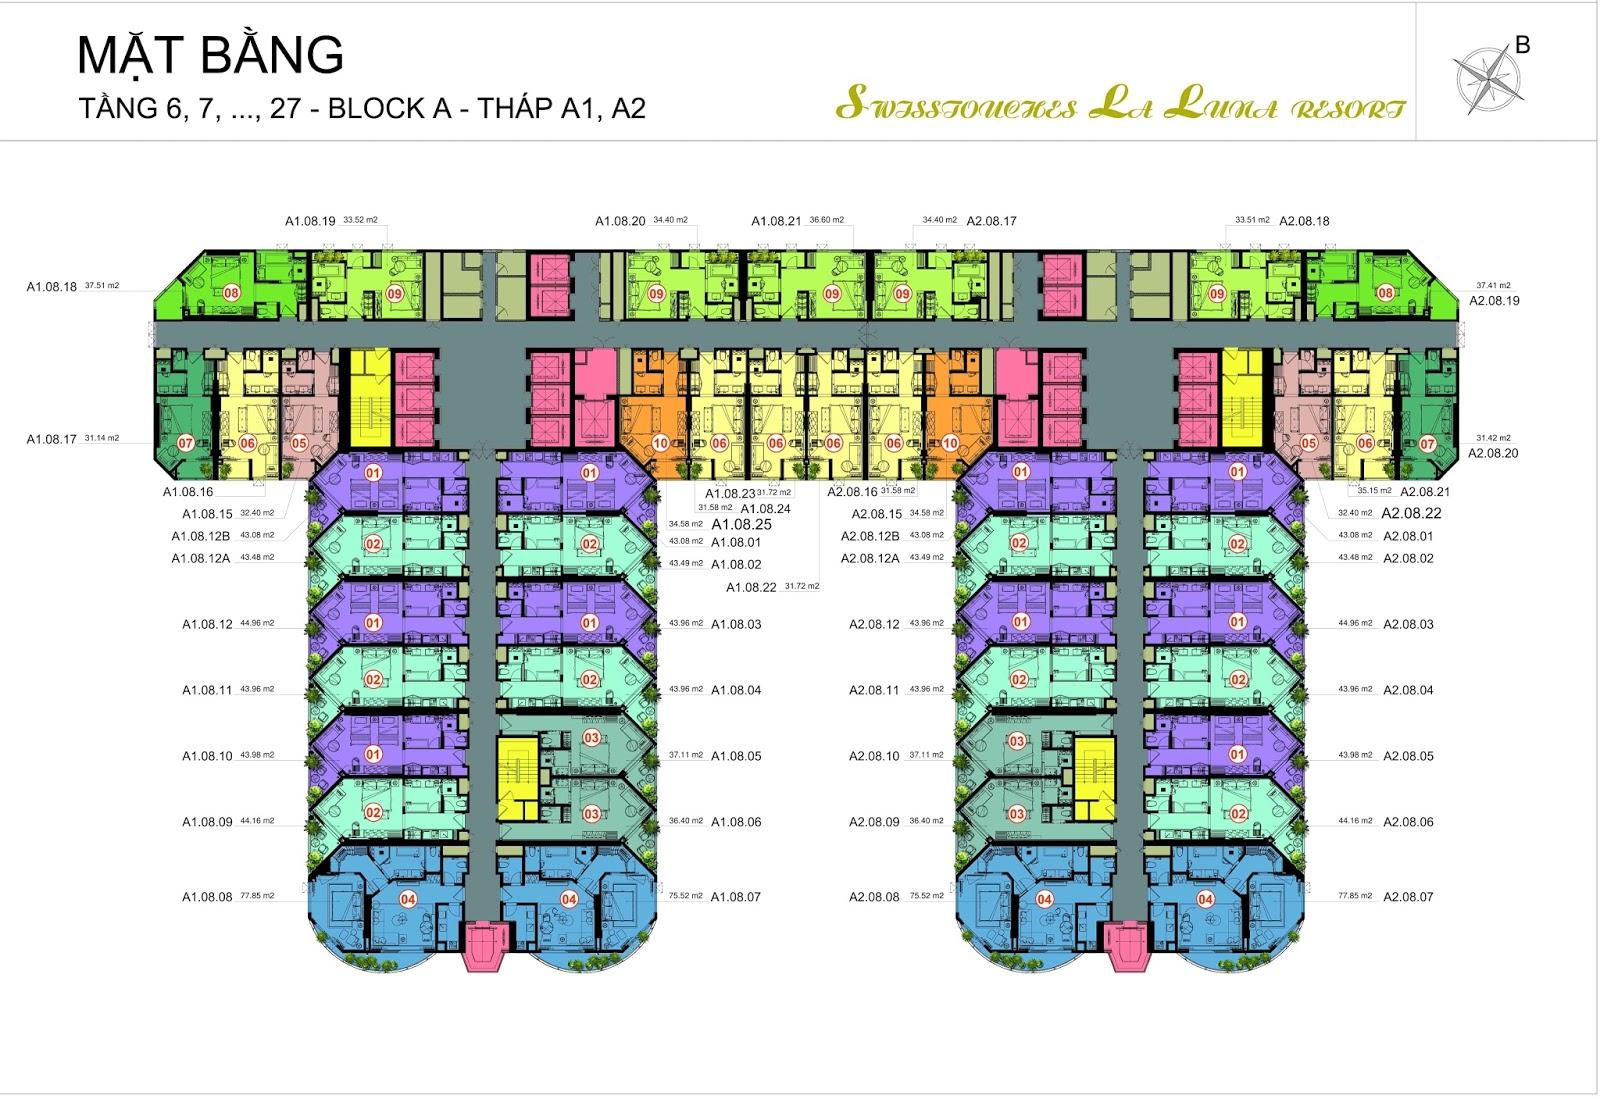 Mặt bằng tòa A dự án La Luna Resort Nha Trang